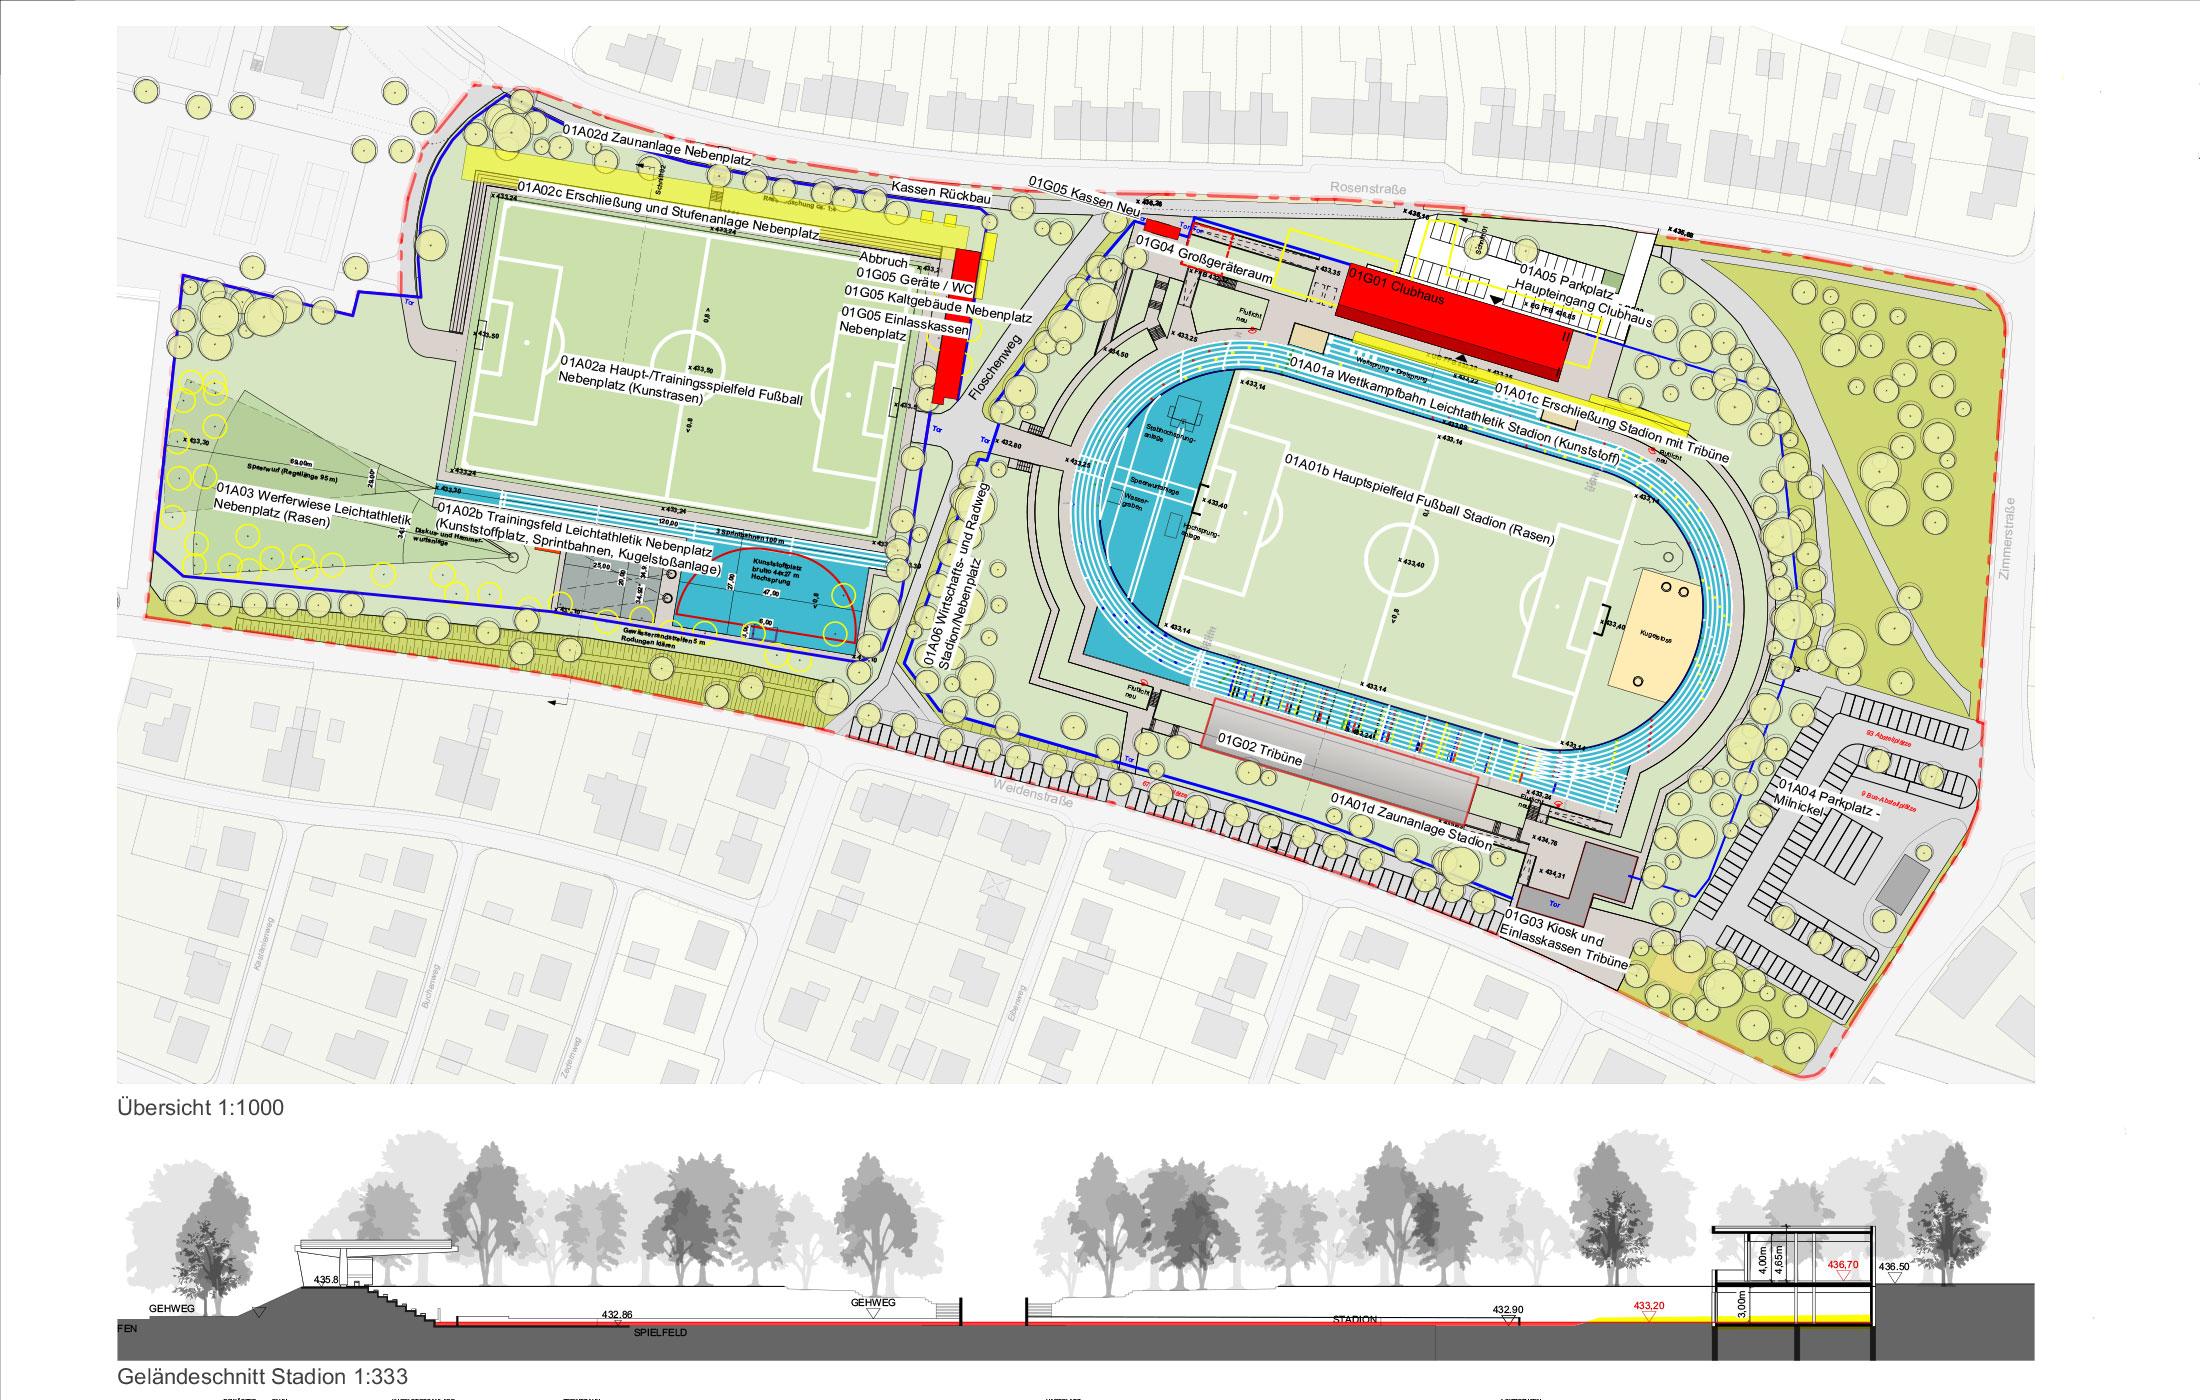 2016, Masterplanung Sportstätten, Sindelfingen